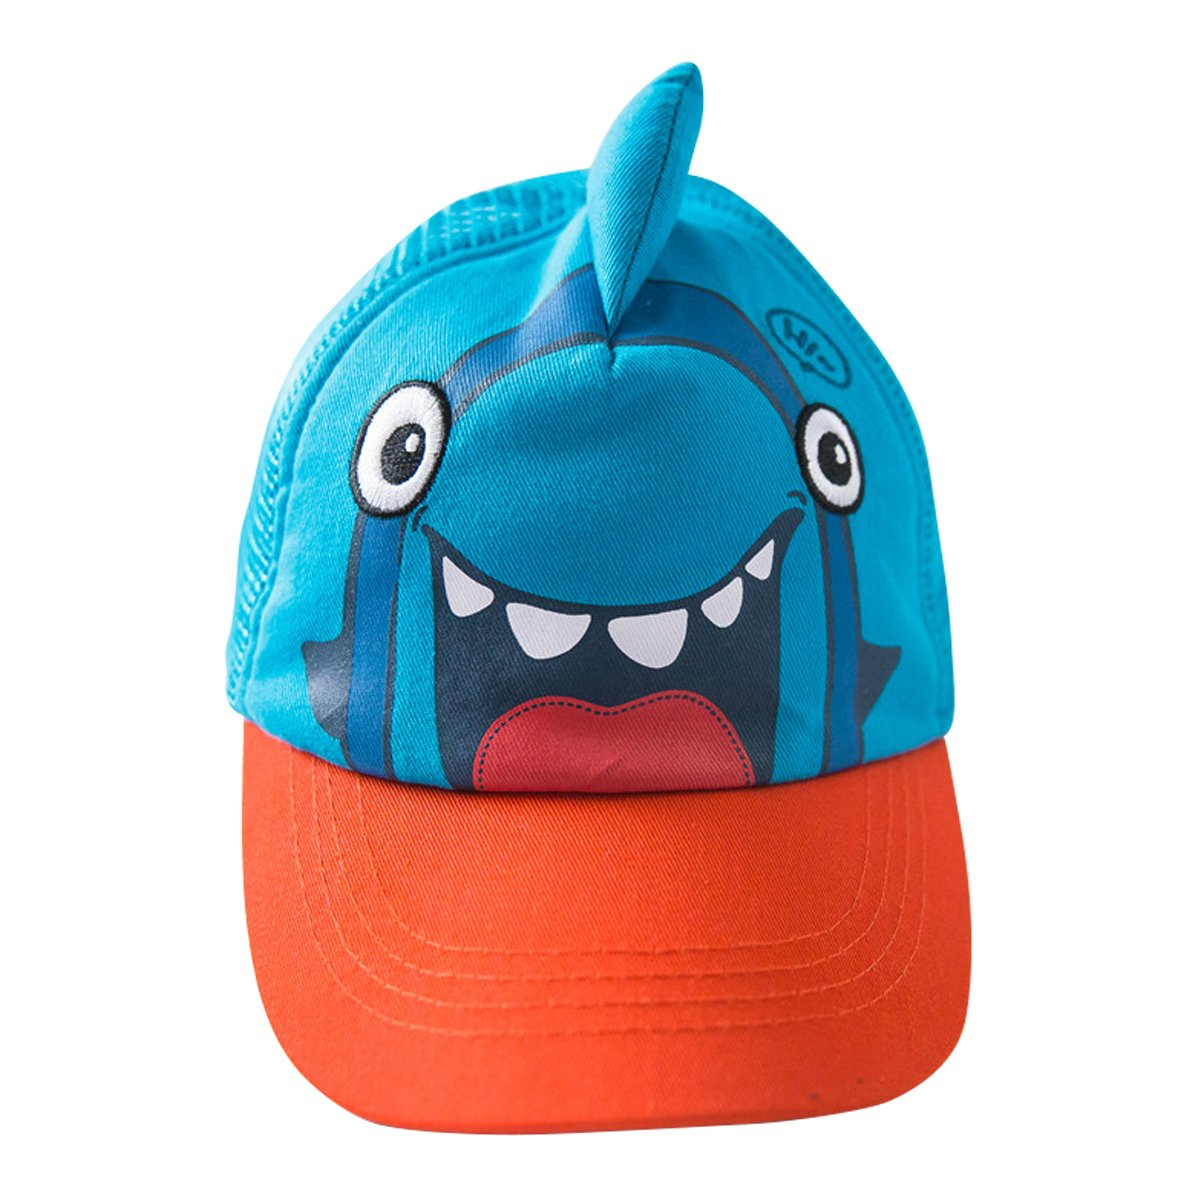 E.mirreh Baby Boys Shark Cartoon Baseball Cap Summer Hat XL